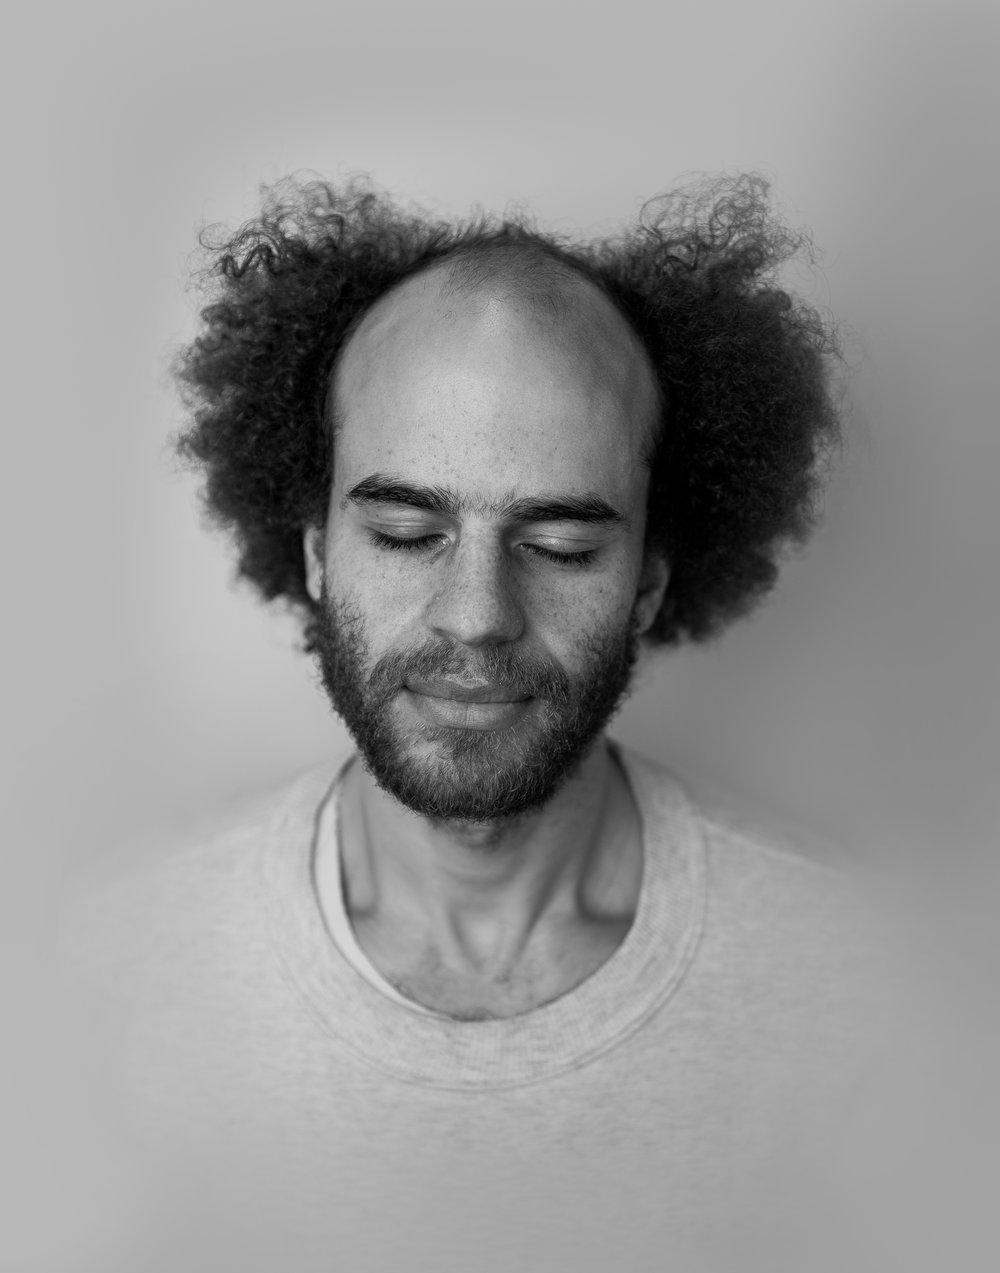 Desmond Miller, Artist, Researcher Photograph by Ebti Nabag